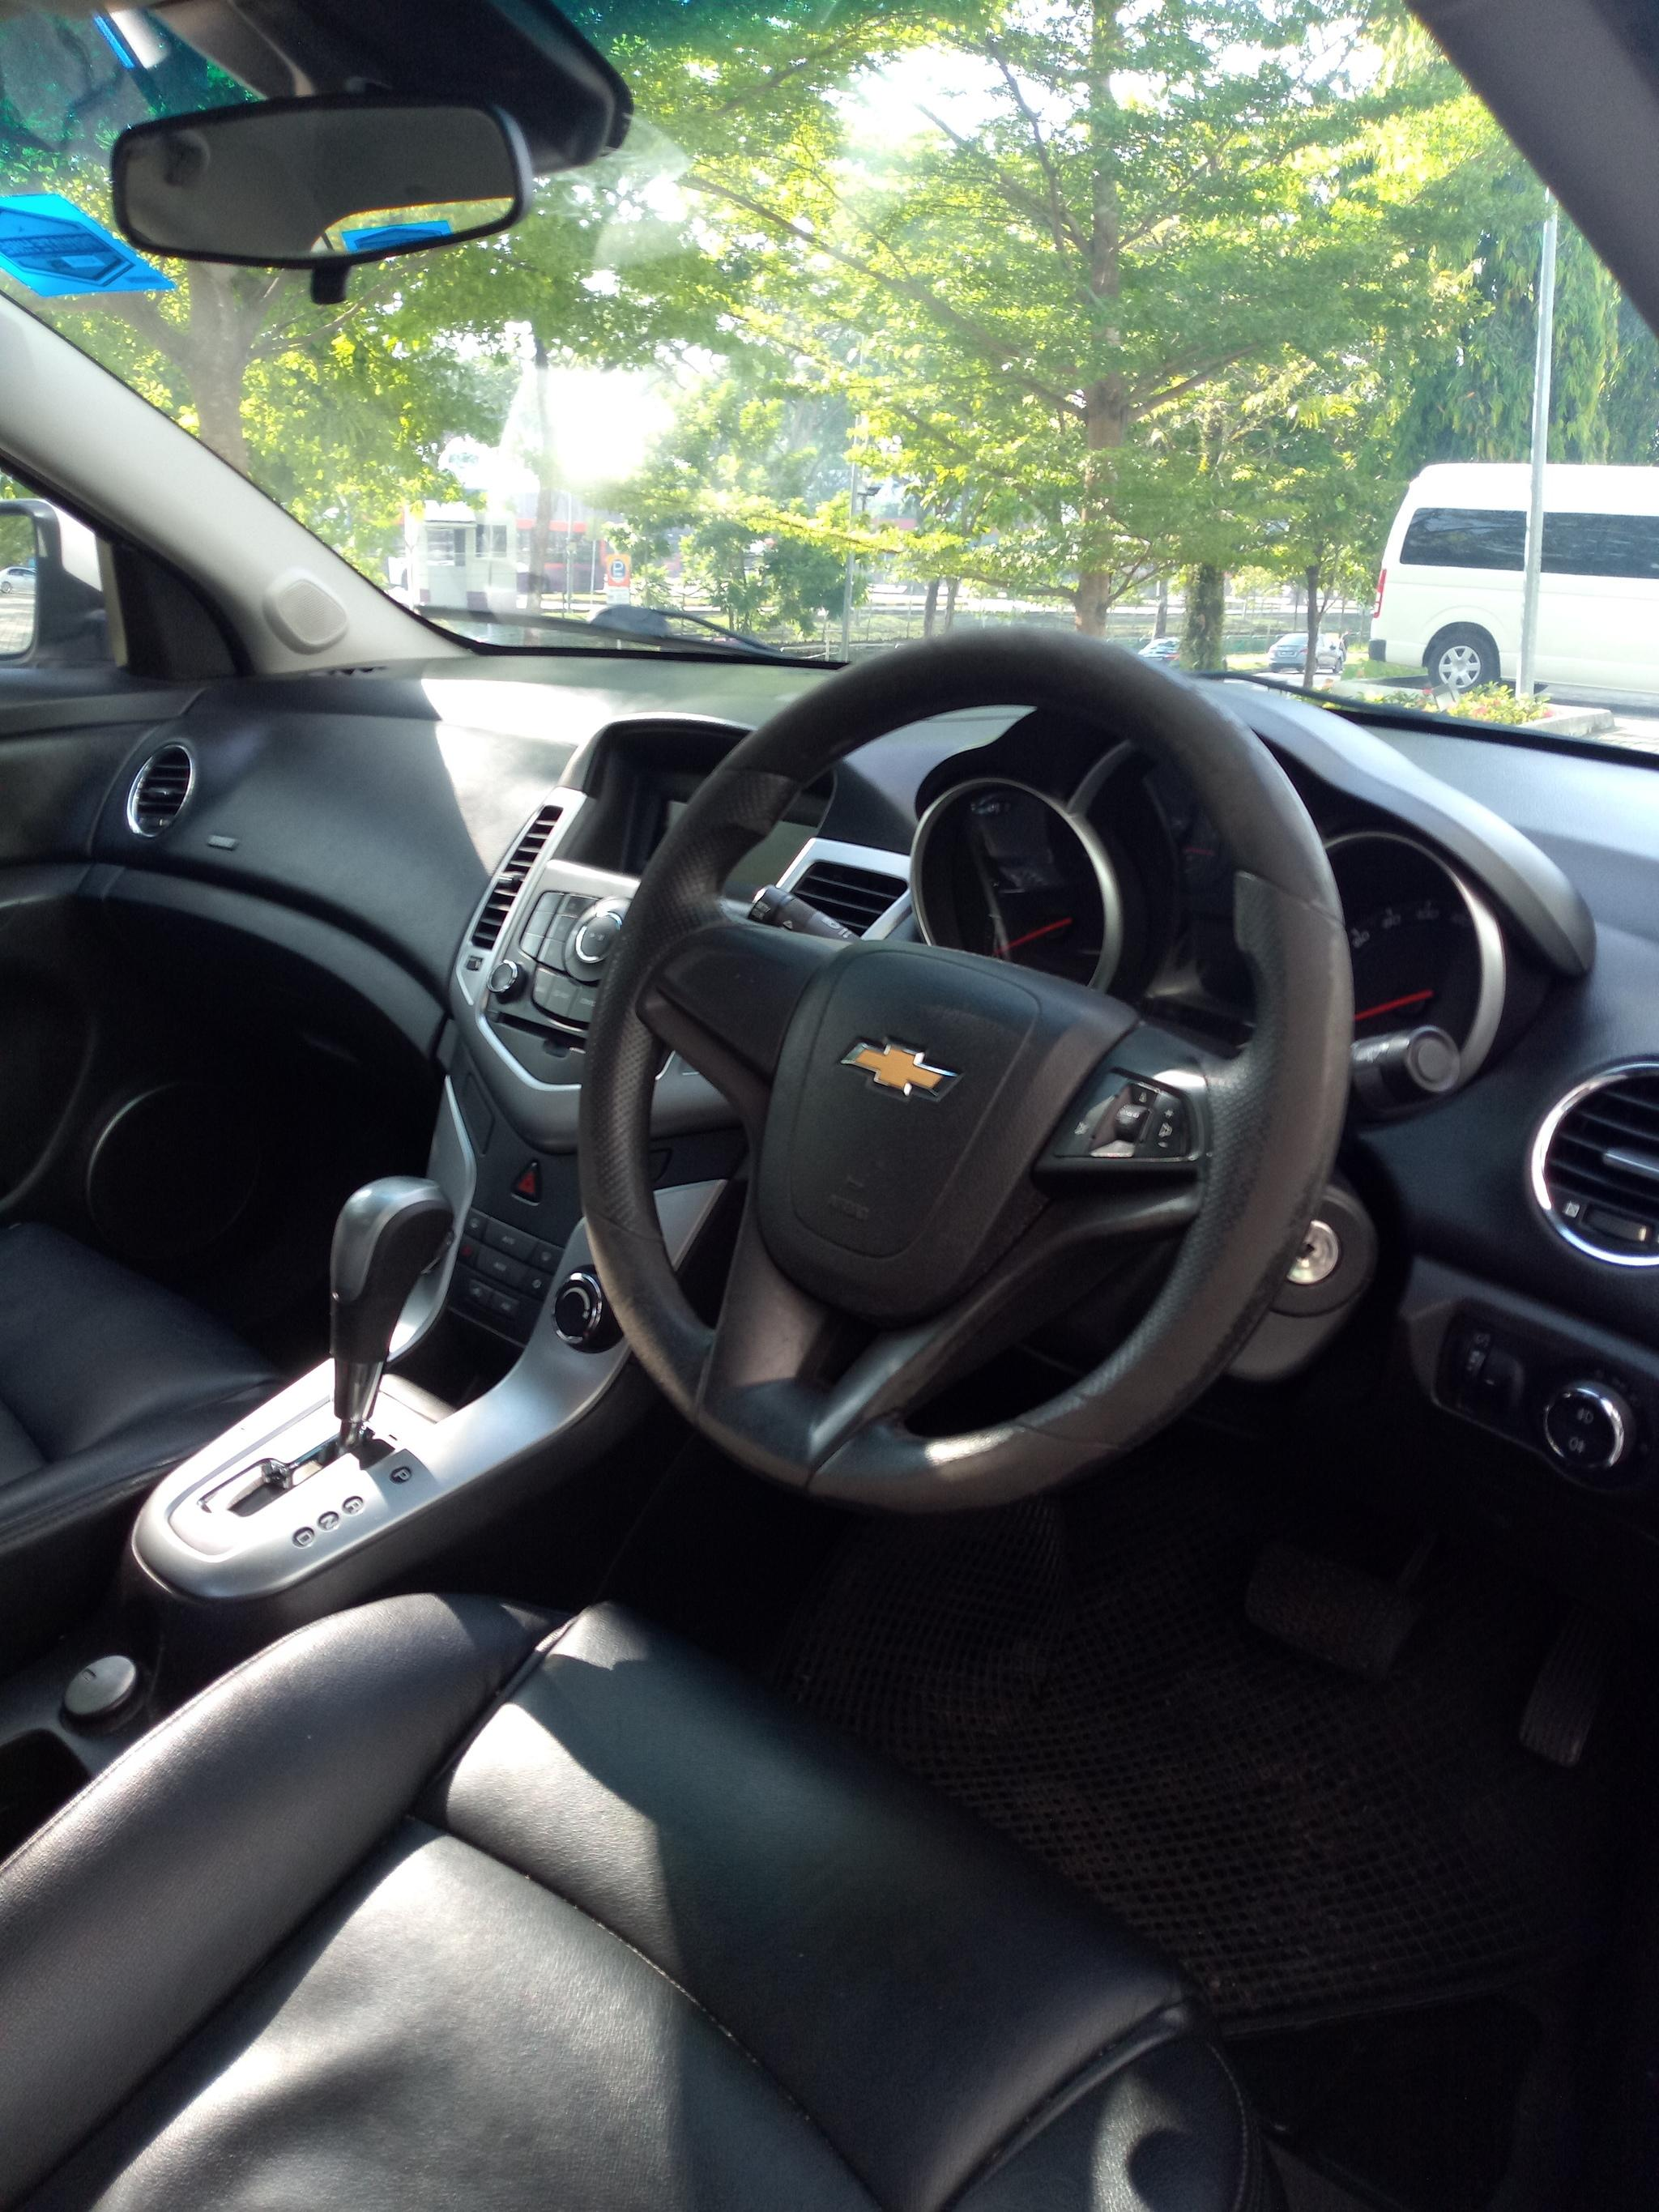 Chevrolet Cruze 1.6A Grab Gojek Ryde Tada & Non PHV Car Rental